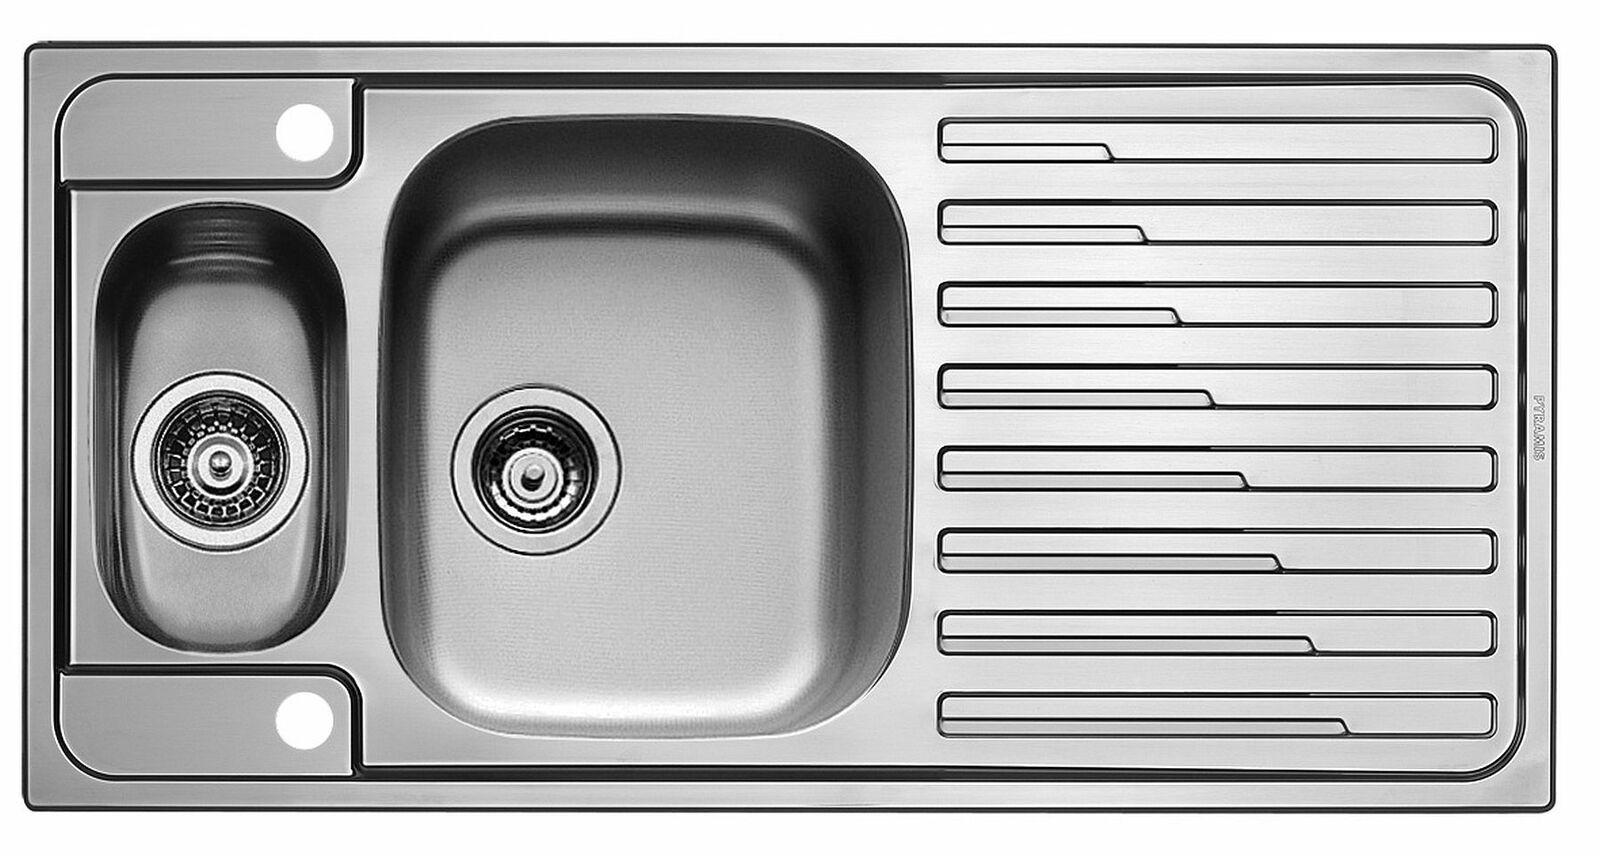 Bevorzugt Küchenspüle 100 cm Edelstahl-Spüle Einbauspüle Hahnloch OD97